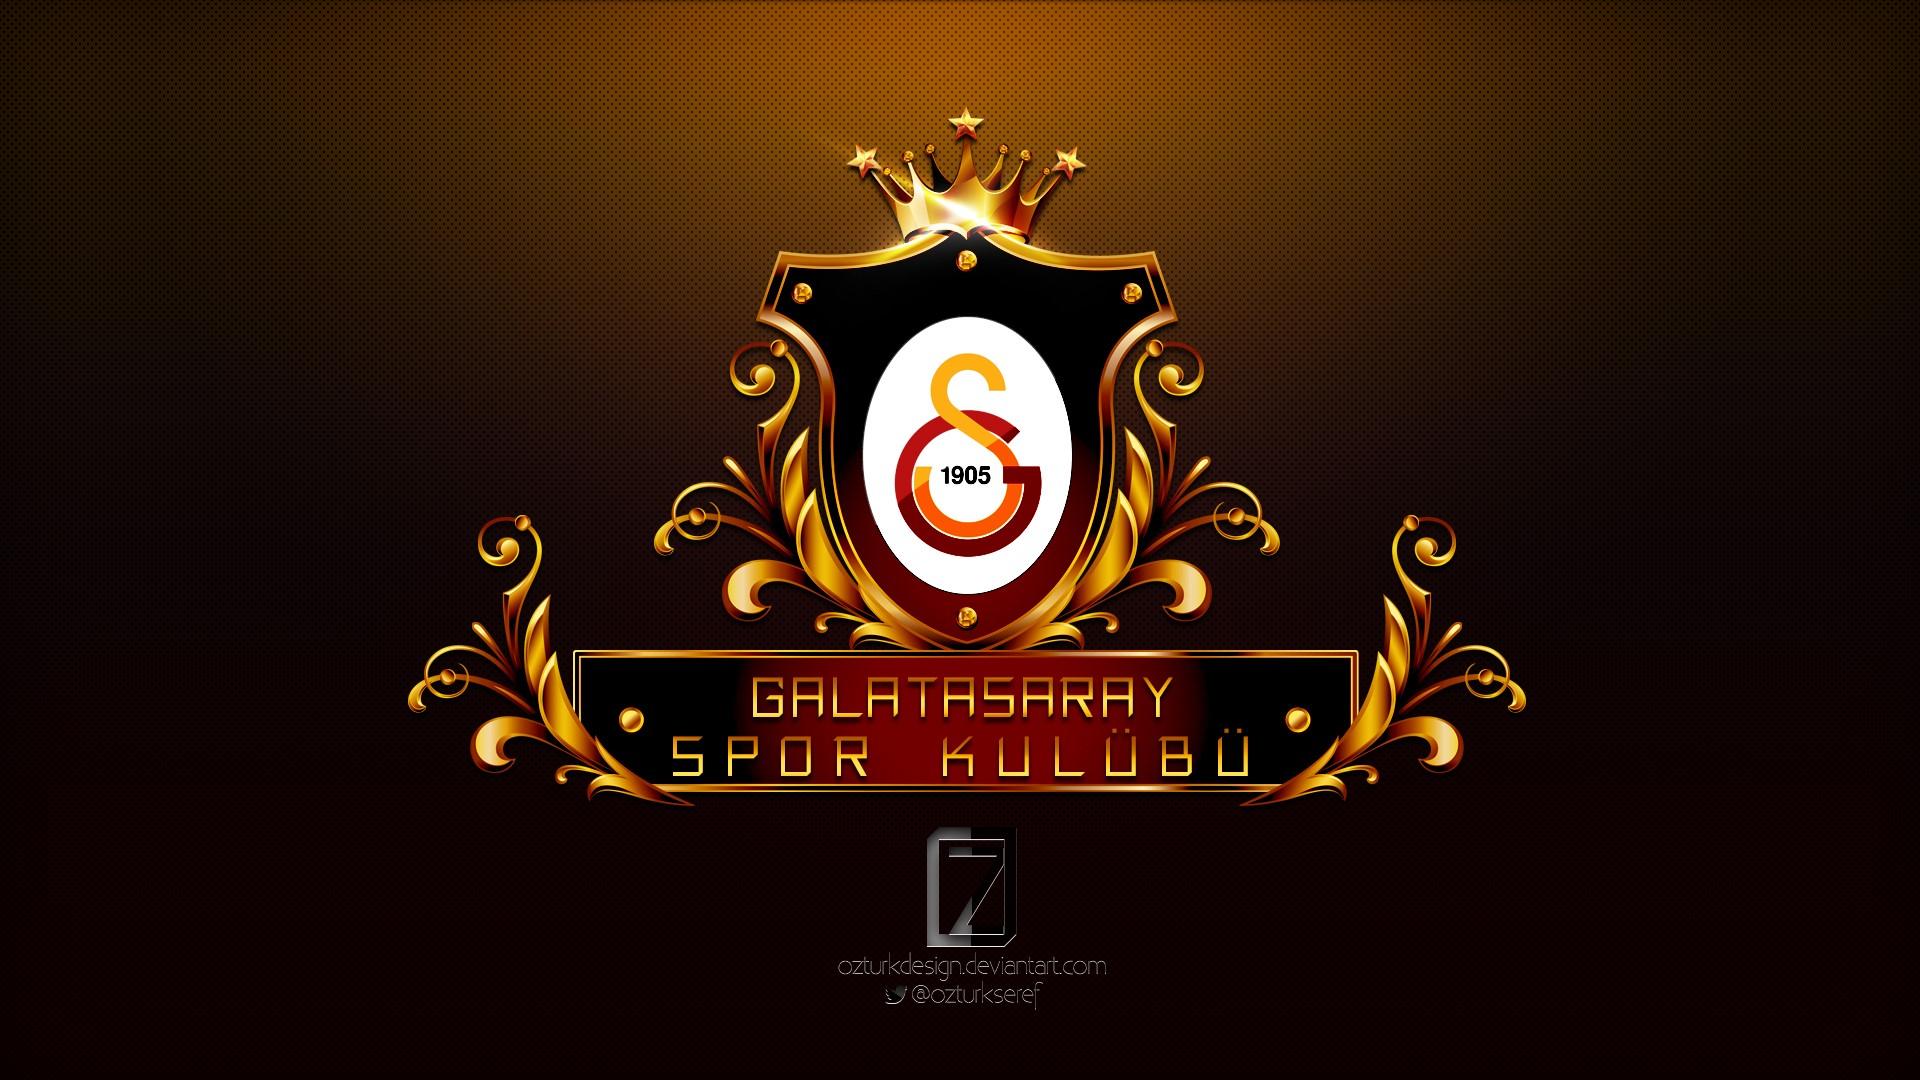 Galatasaray Spor Kulübü Logo